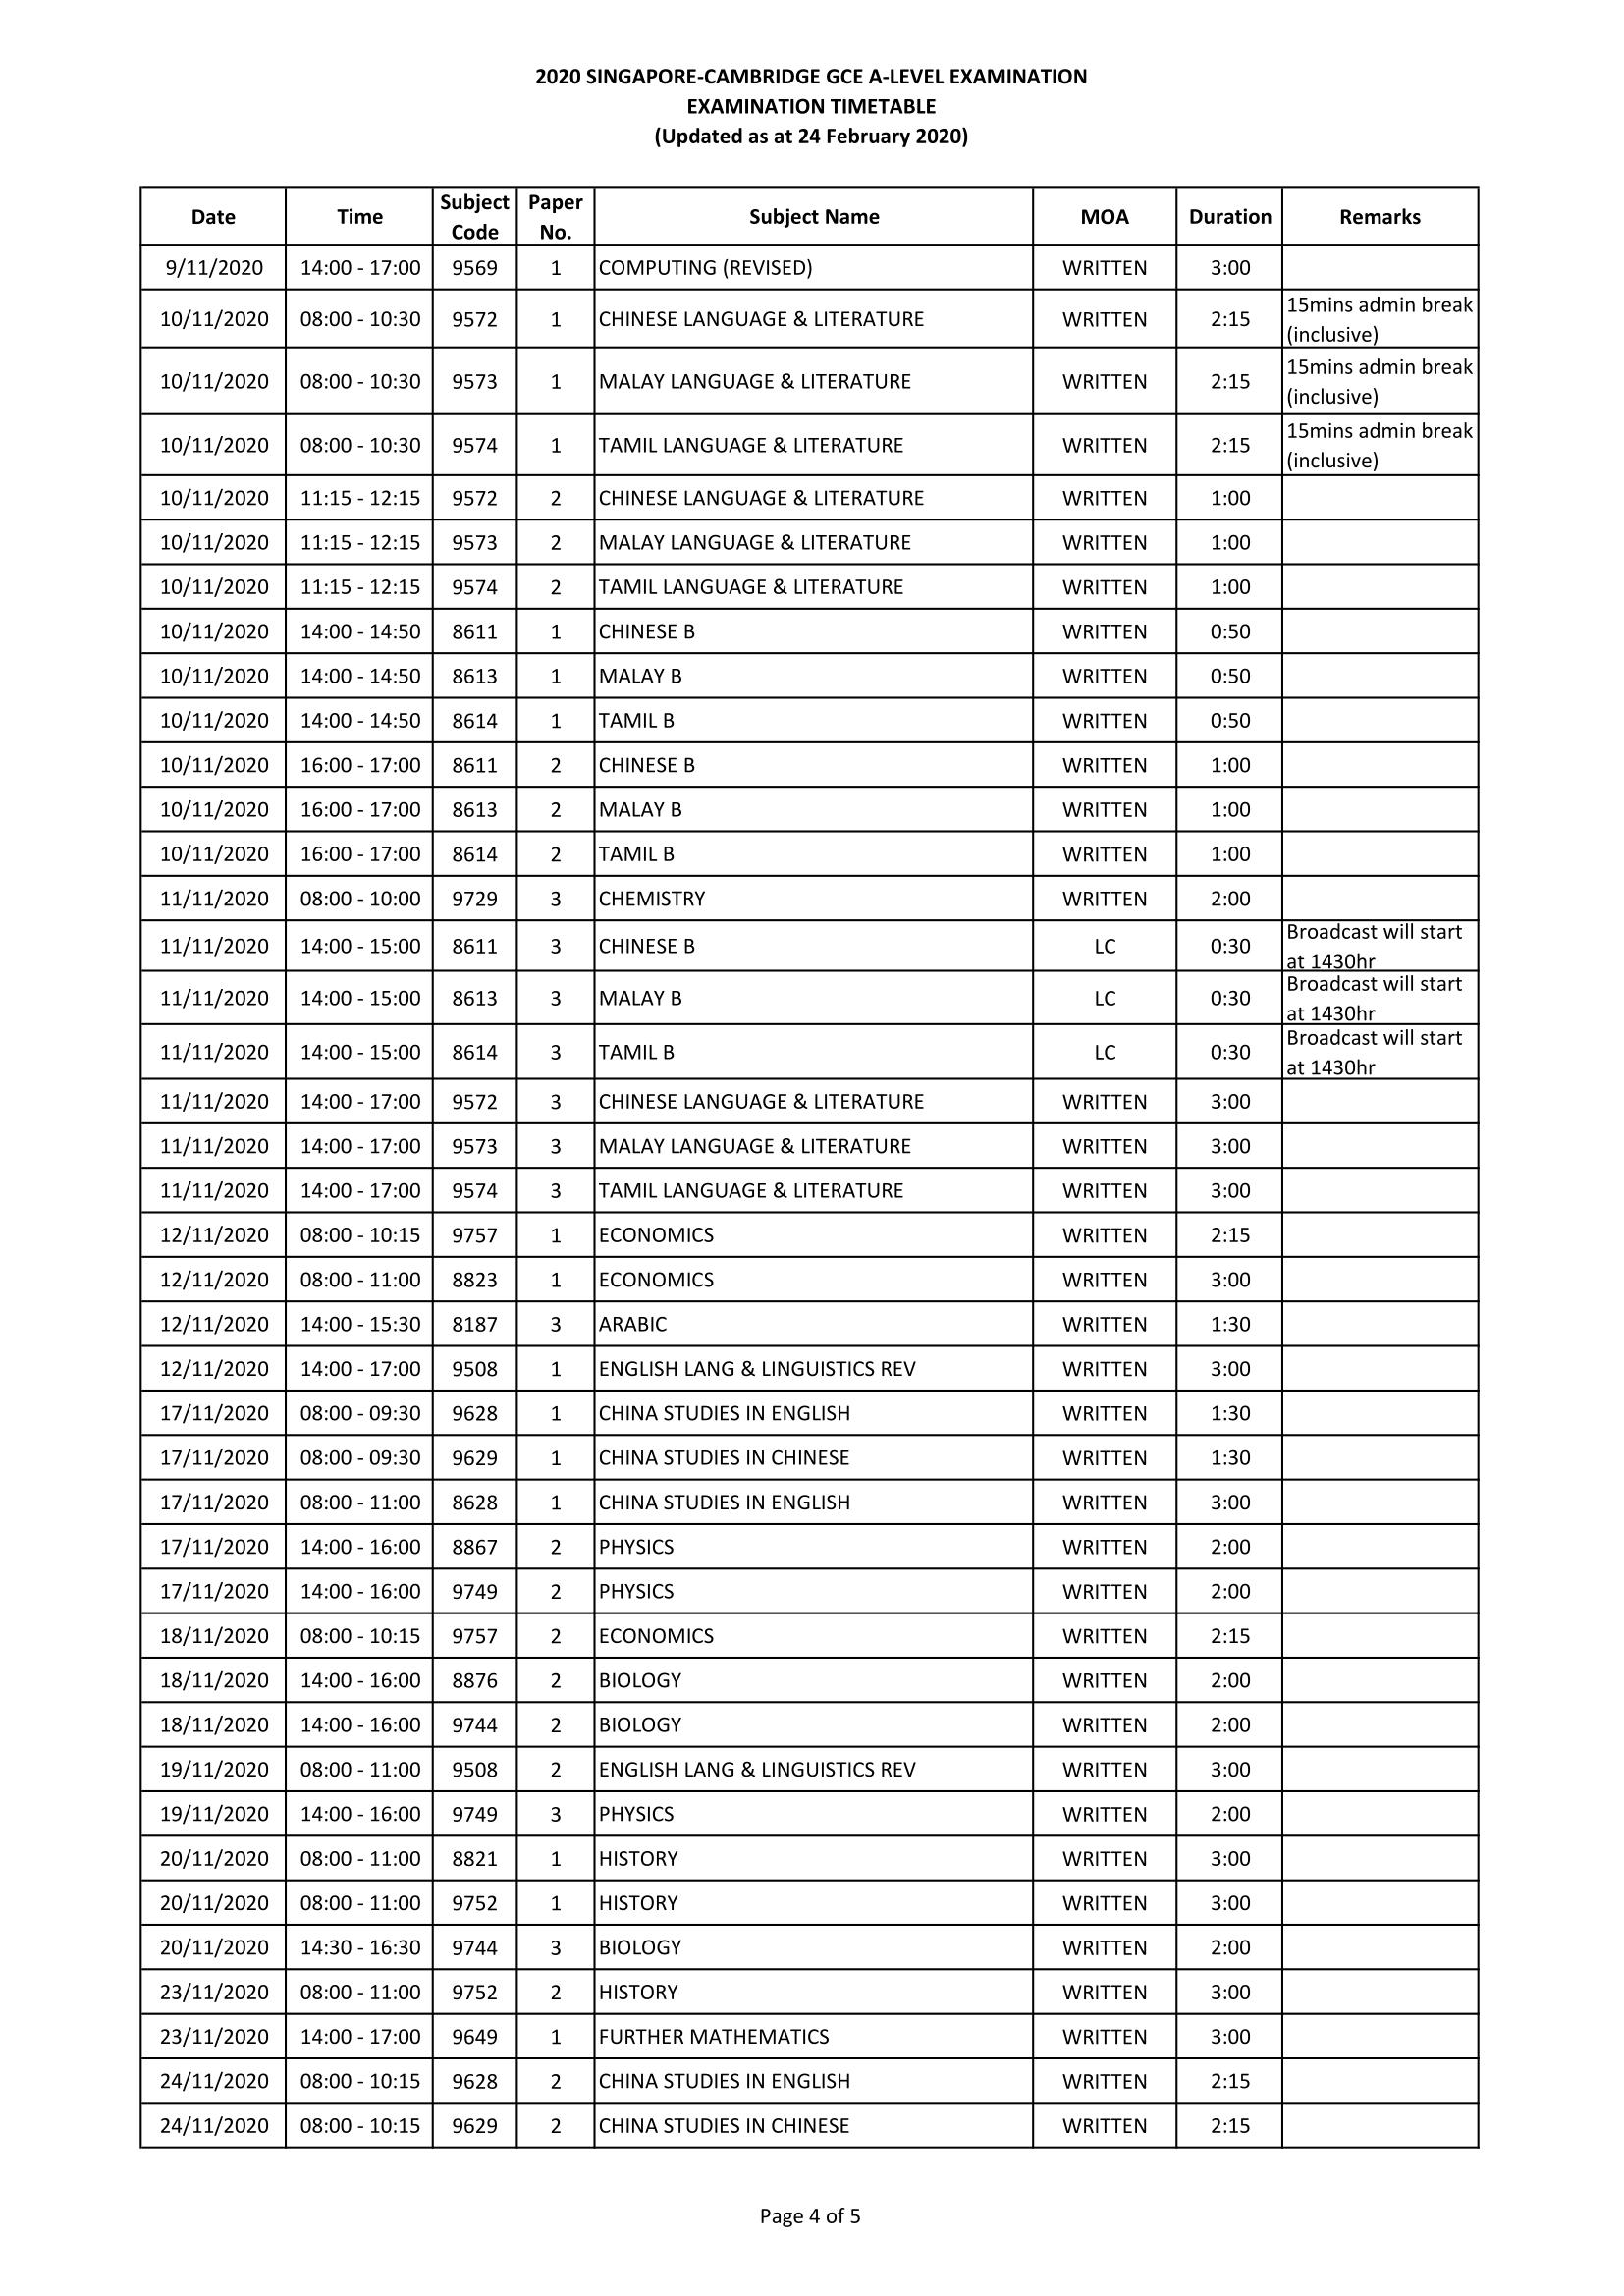 A Level Exam Schedule 2020 4